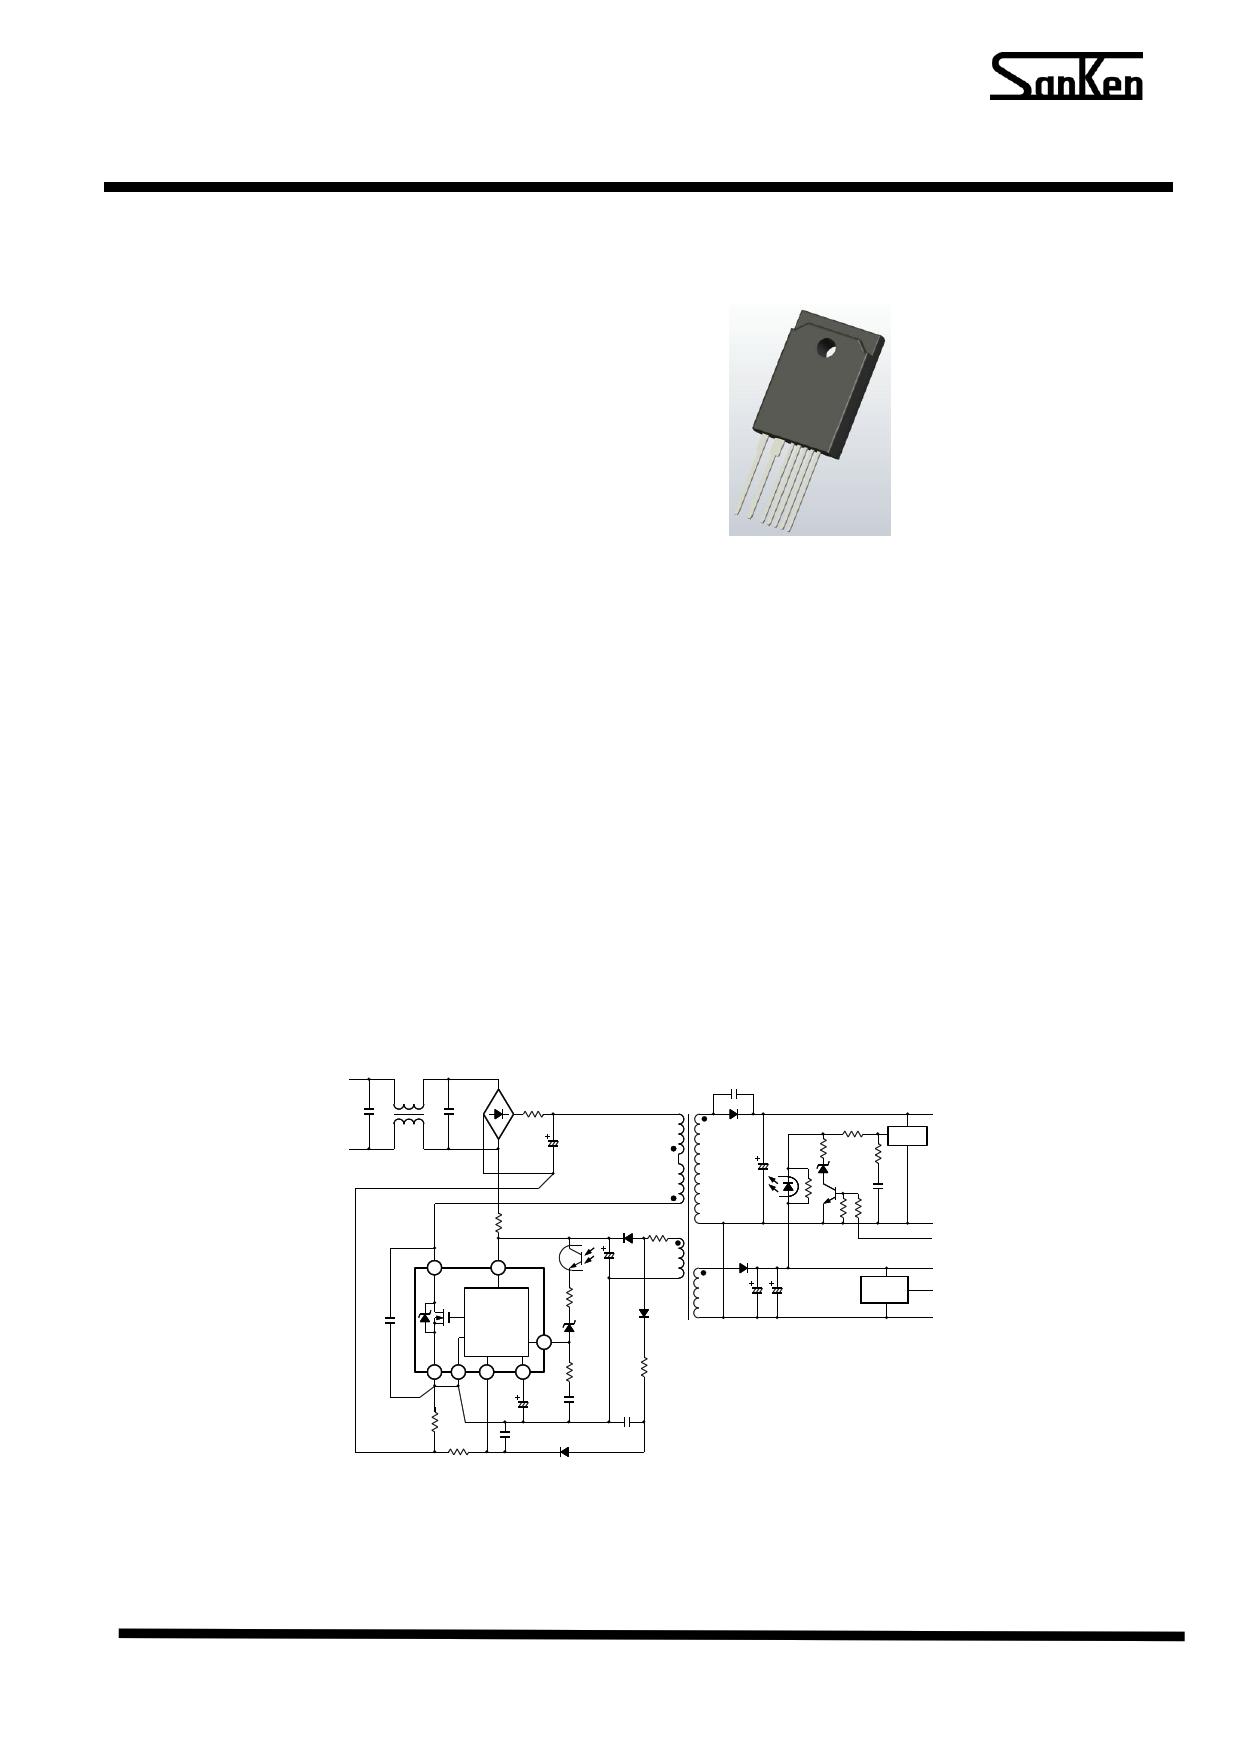 STR-X6750F image